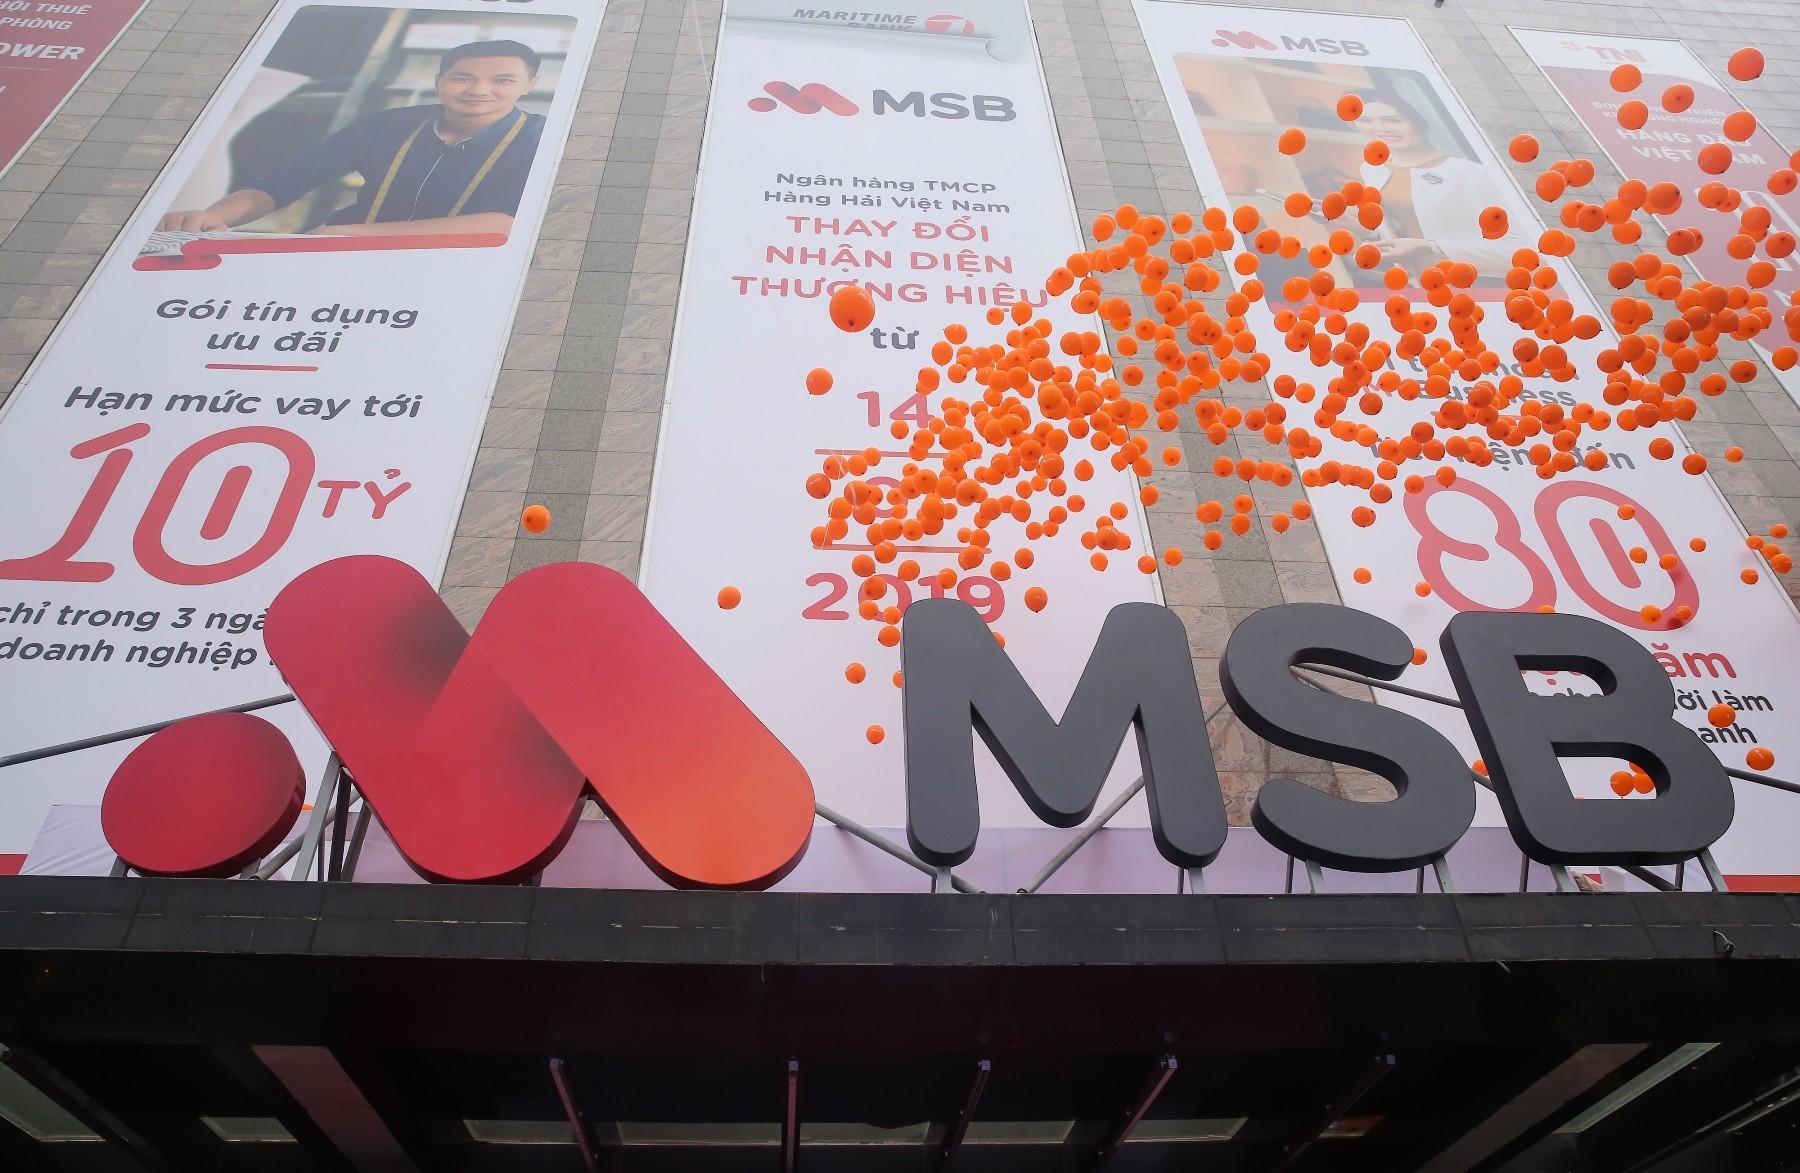 Vietnamese bank MSB postpones IPO due to COVID-19